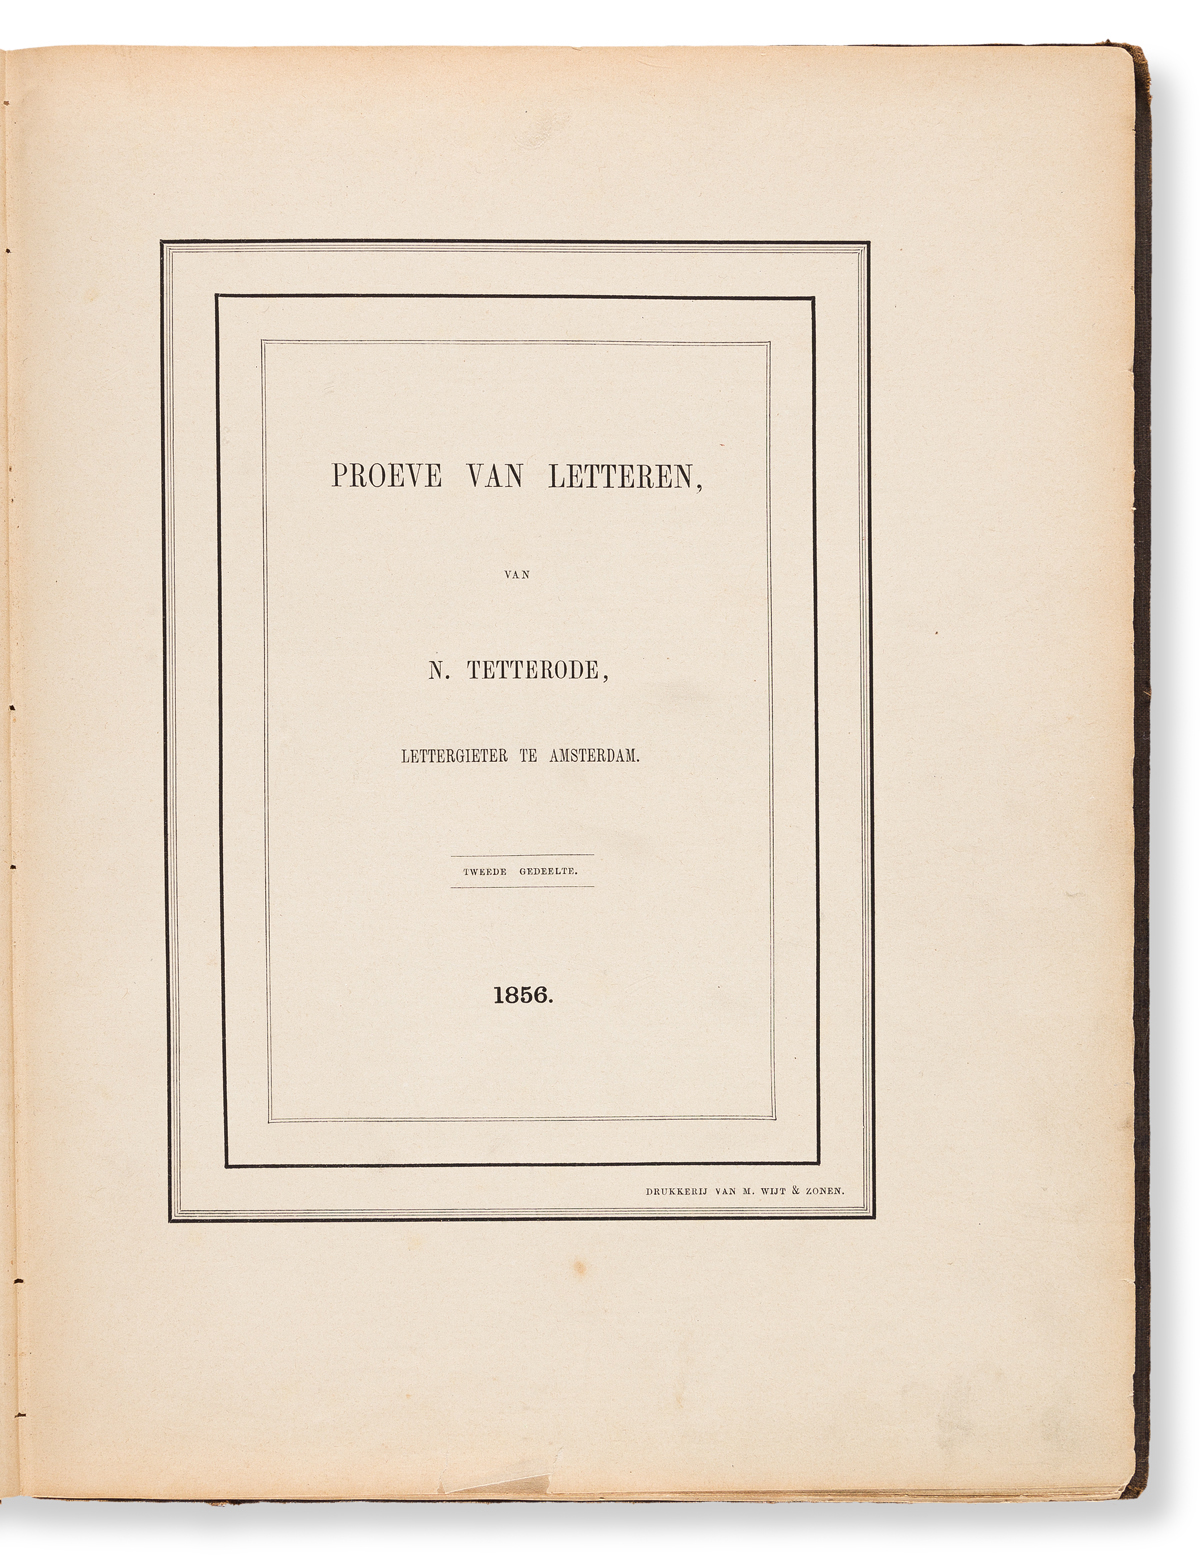 [SPECIMEN BOOK — N. TETTERODE]. Proeve van Letteren, van N. Tetterode, Lettergieter te Amsterdam, Tweed Gedeelte (Second Section). Rott